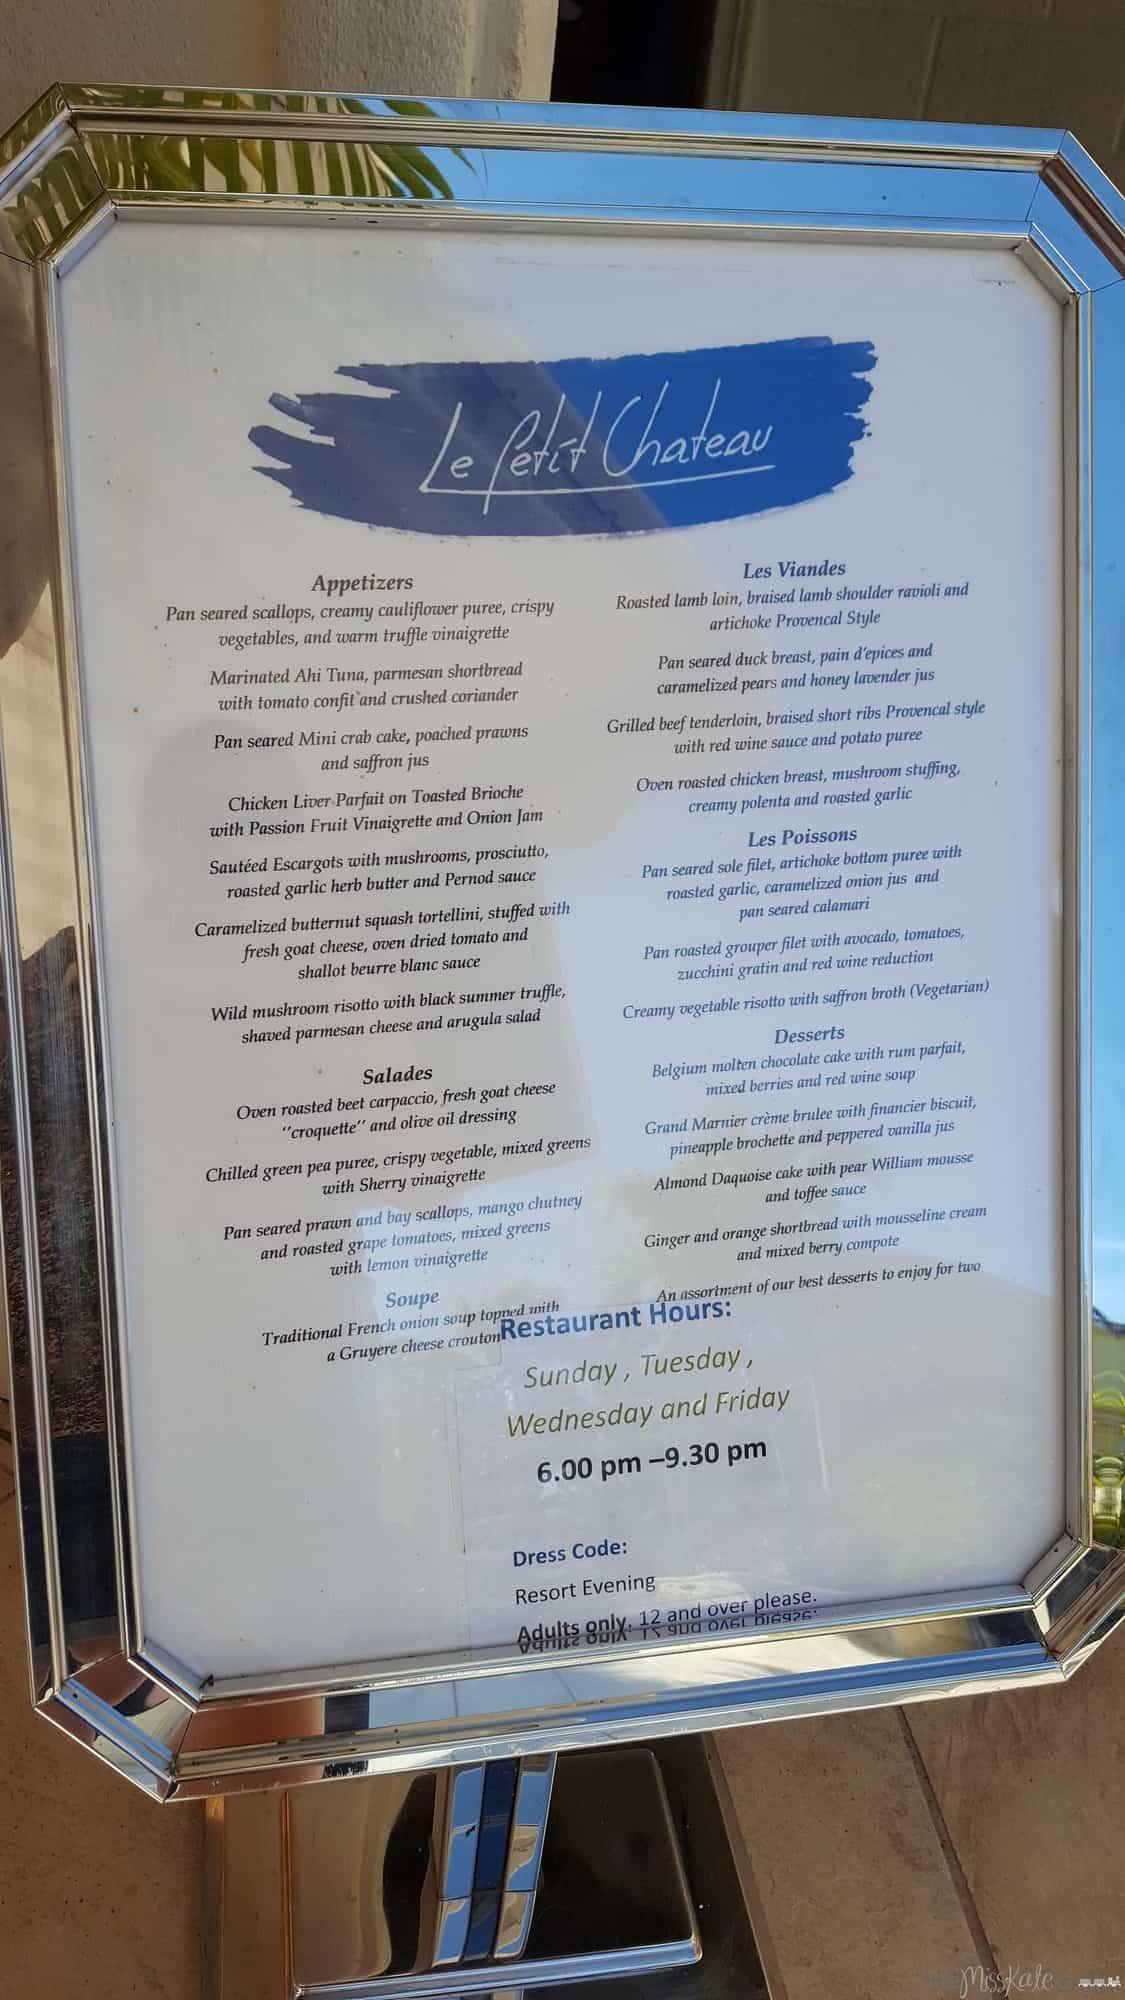 Beaches Resort Villages Turks and Caicos Restaurants - Le Petit Chateu via littlemisskate.ca